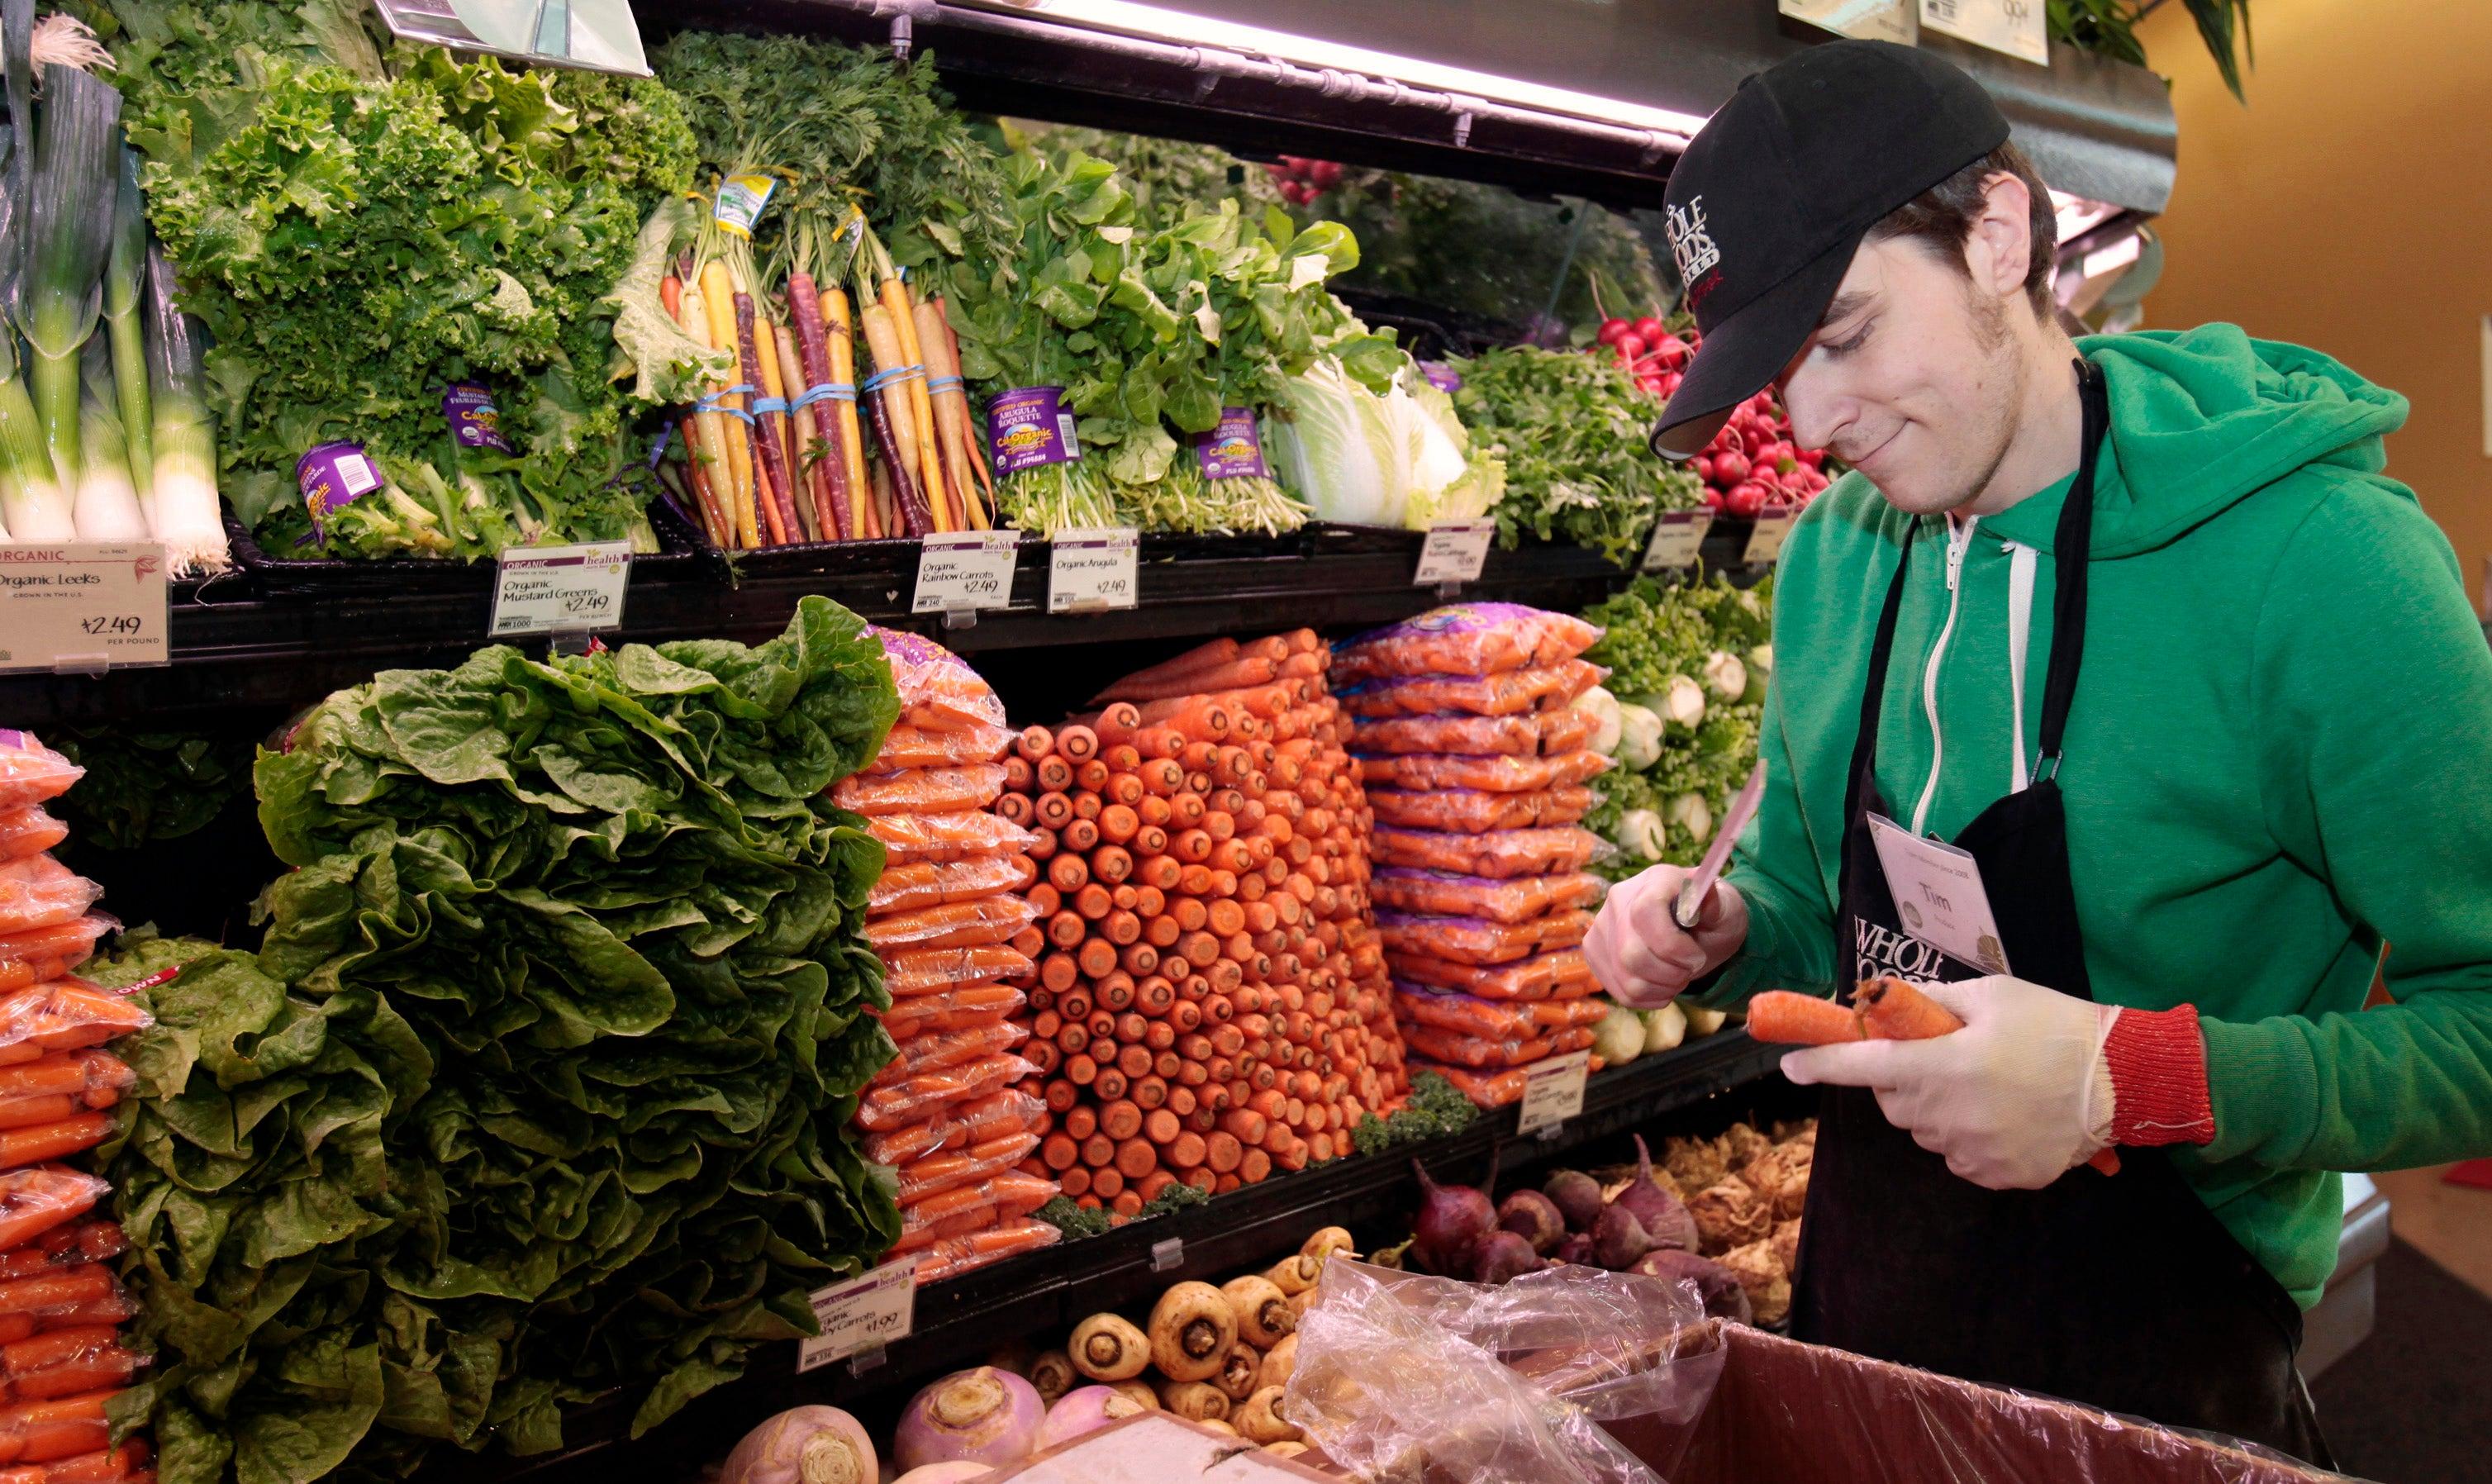 whole foods market employee